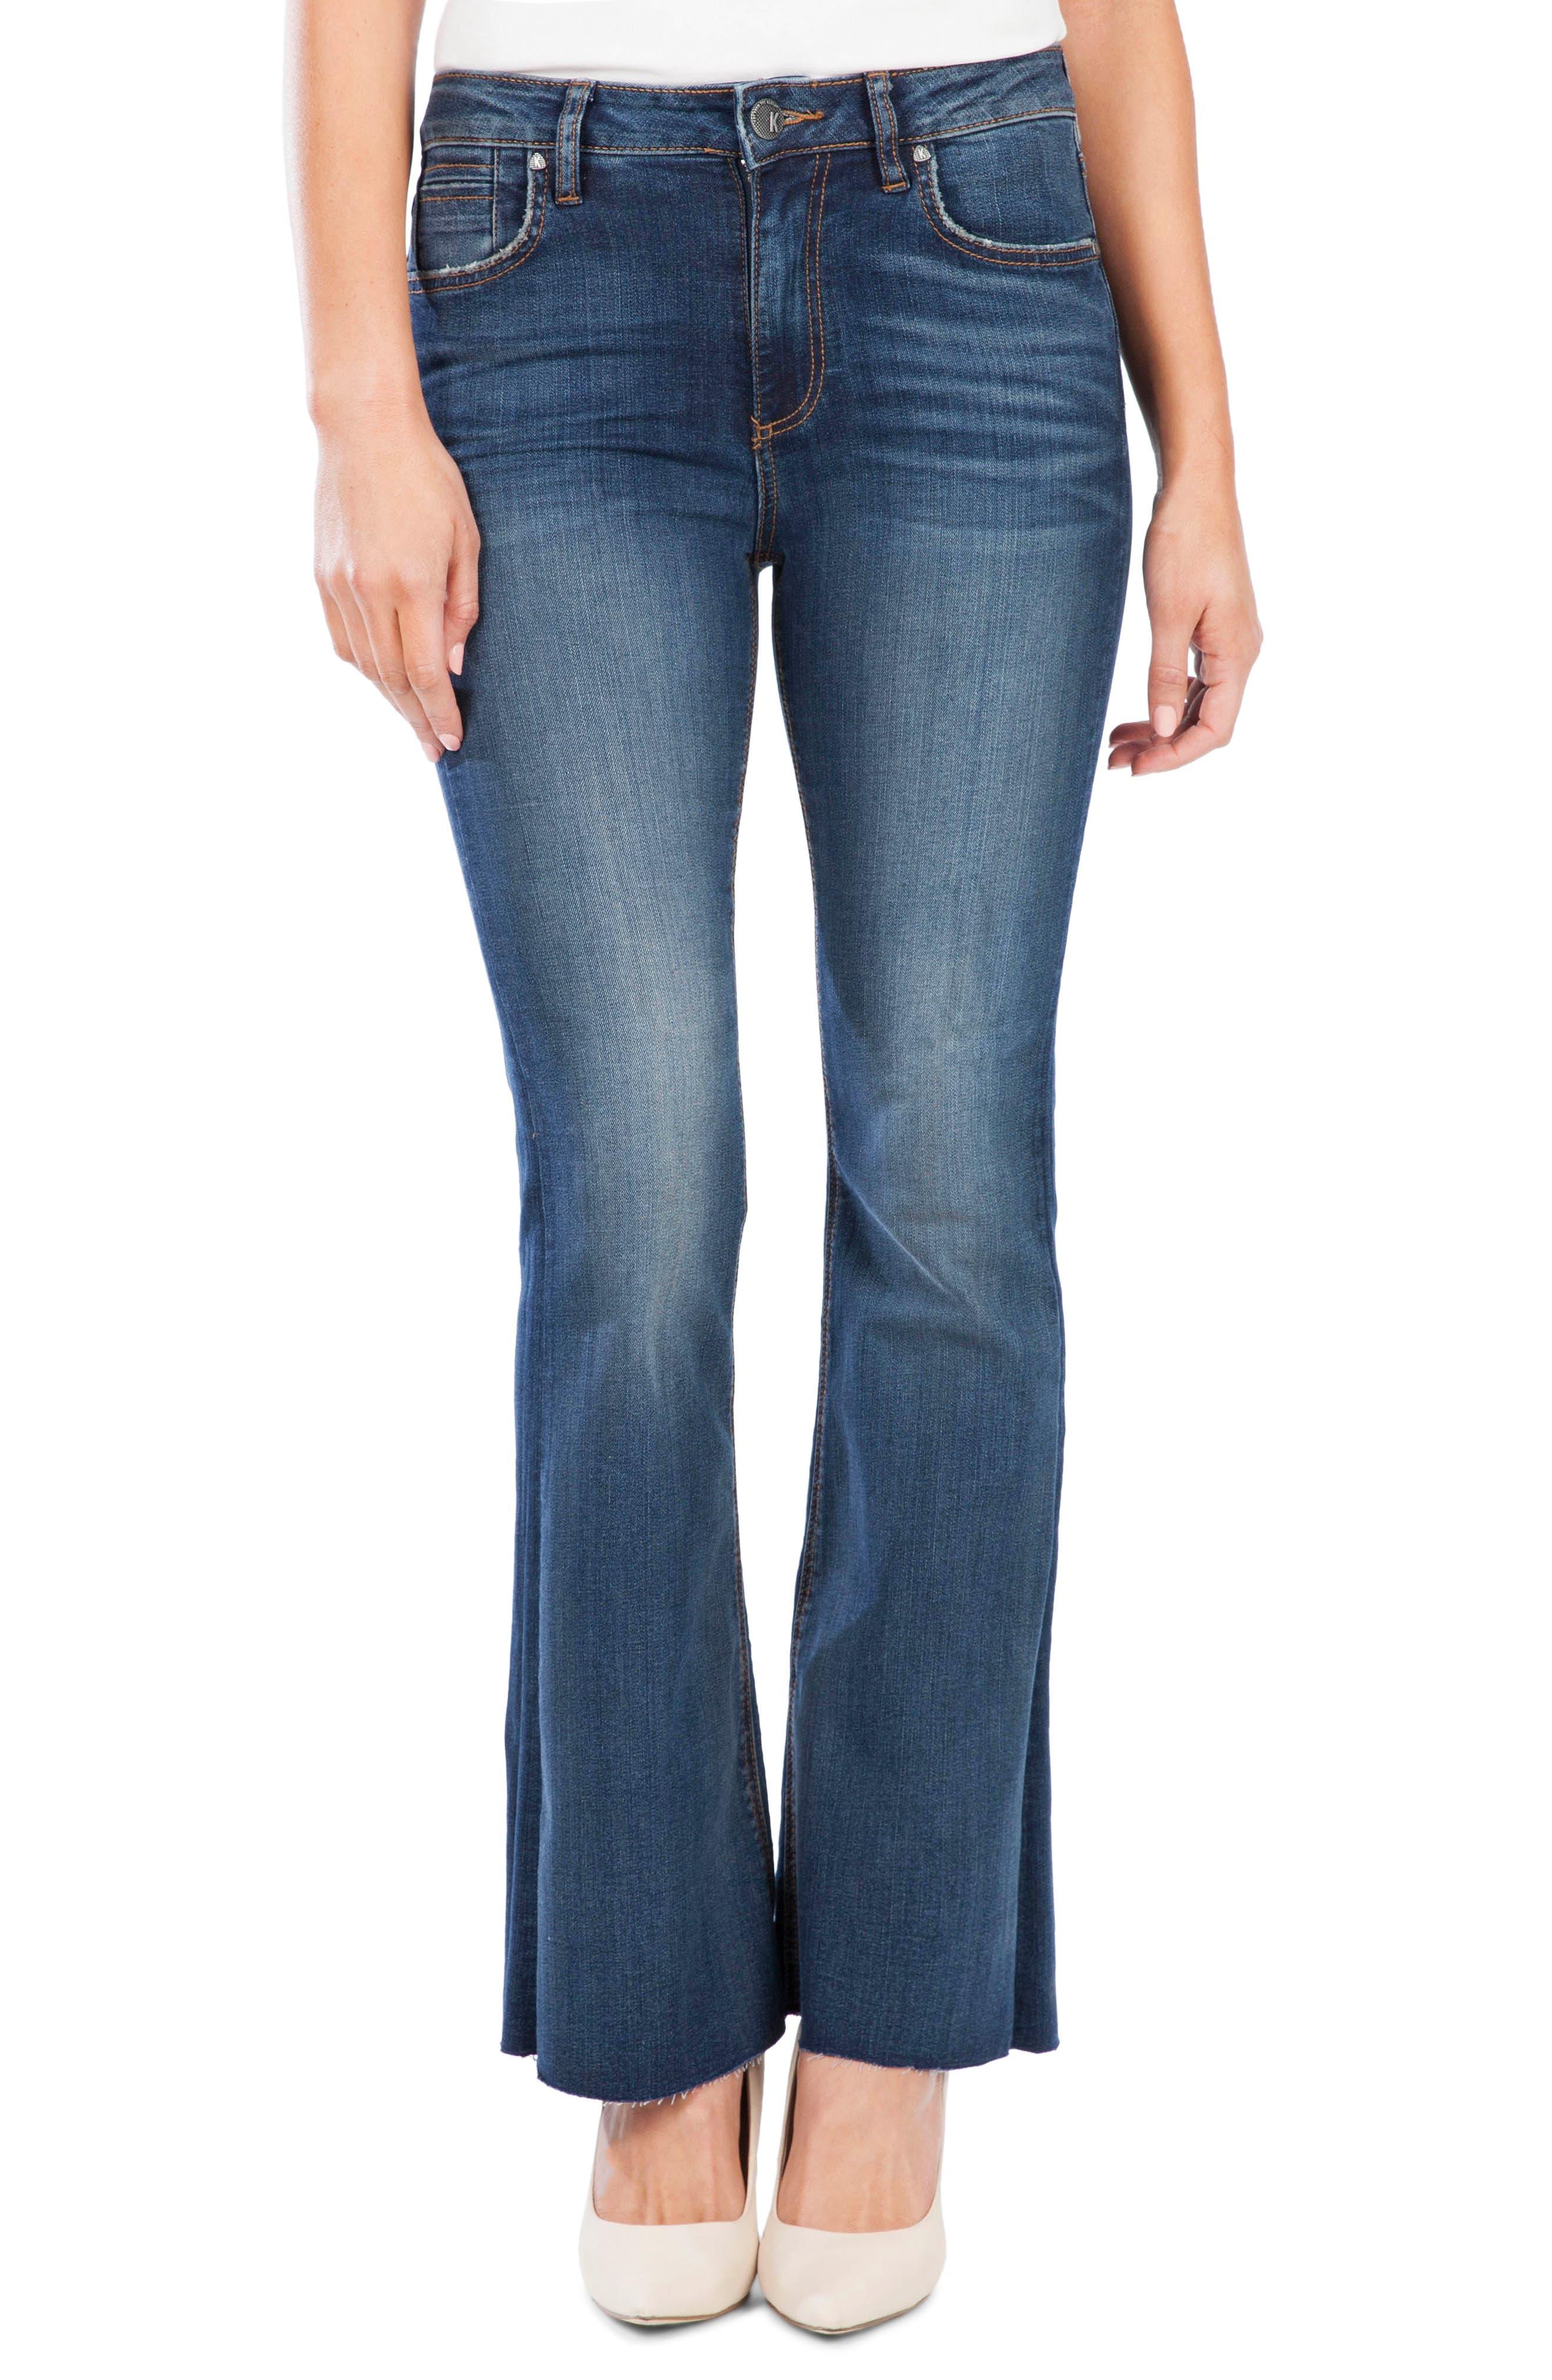 Women's Kut From The Kloth Stella High Waist Raw Hem Flare Jeans